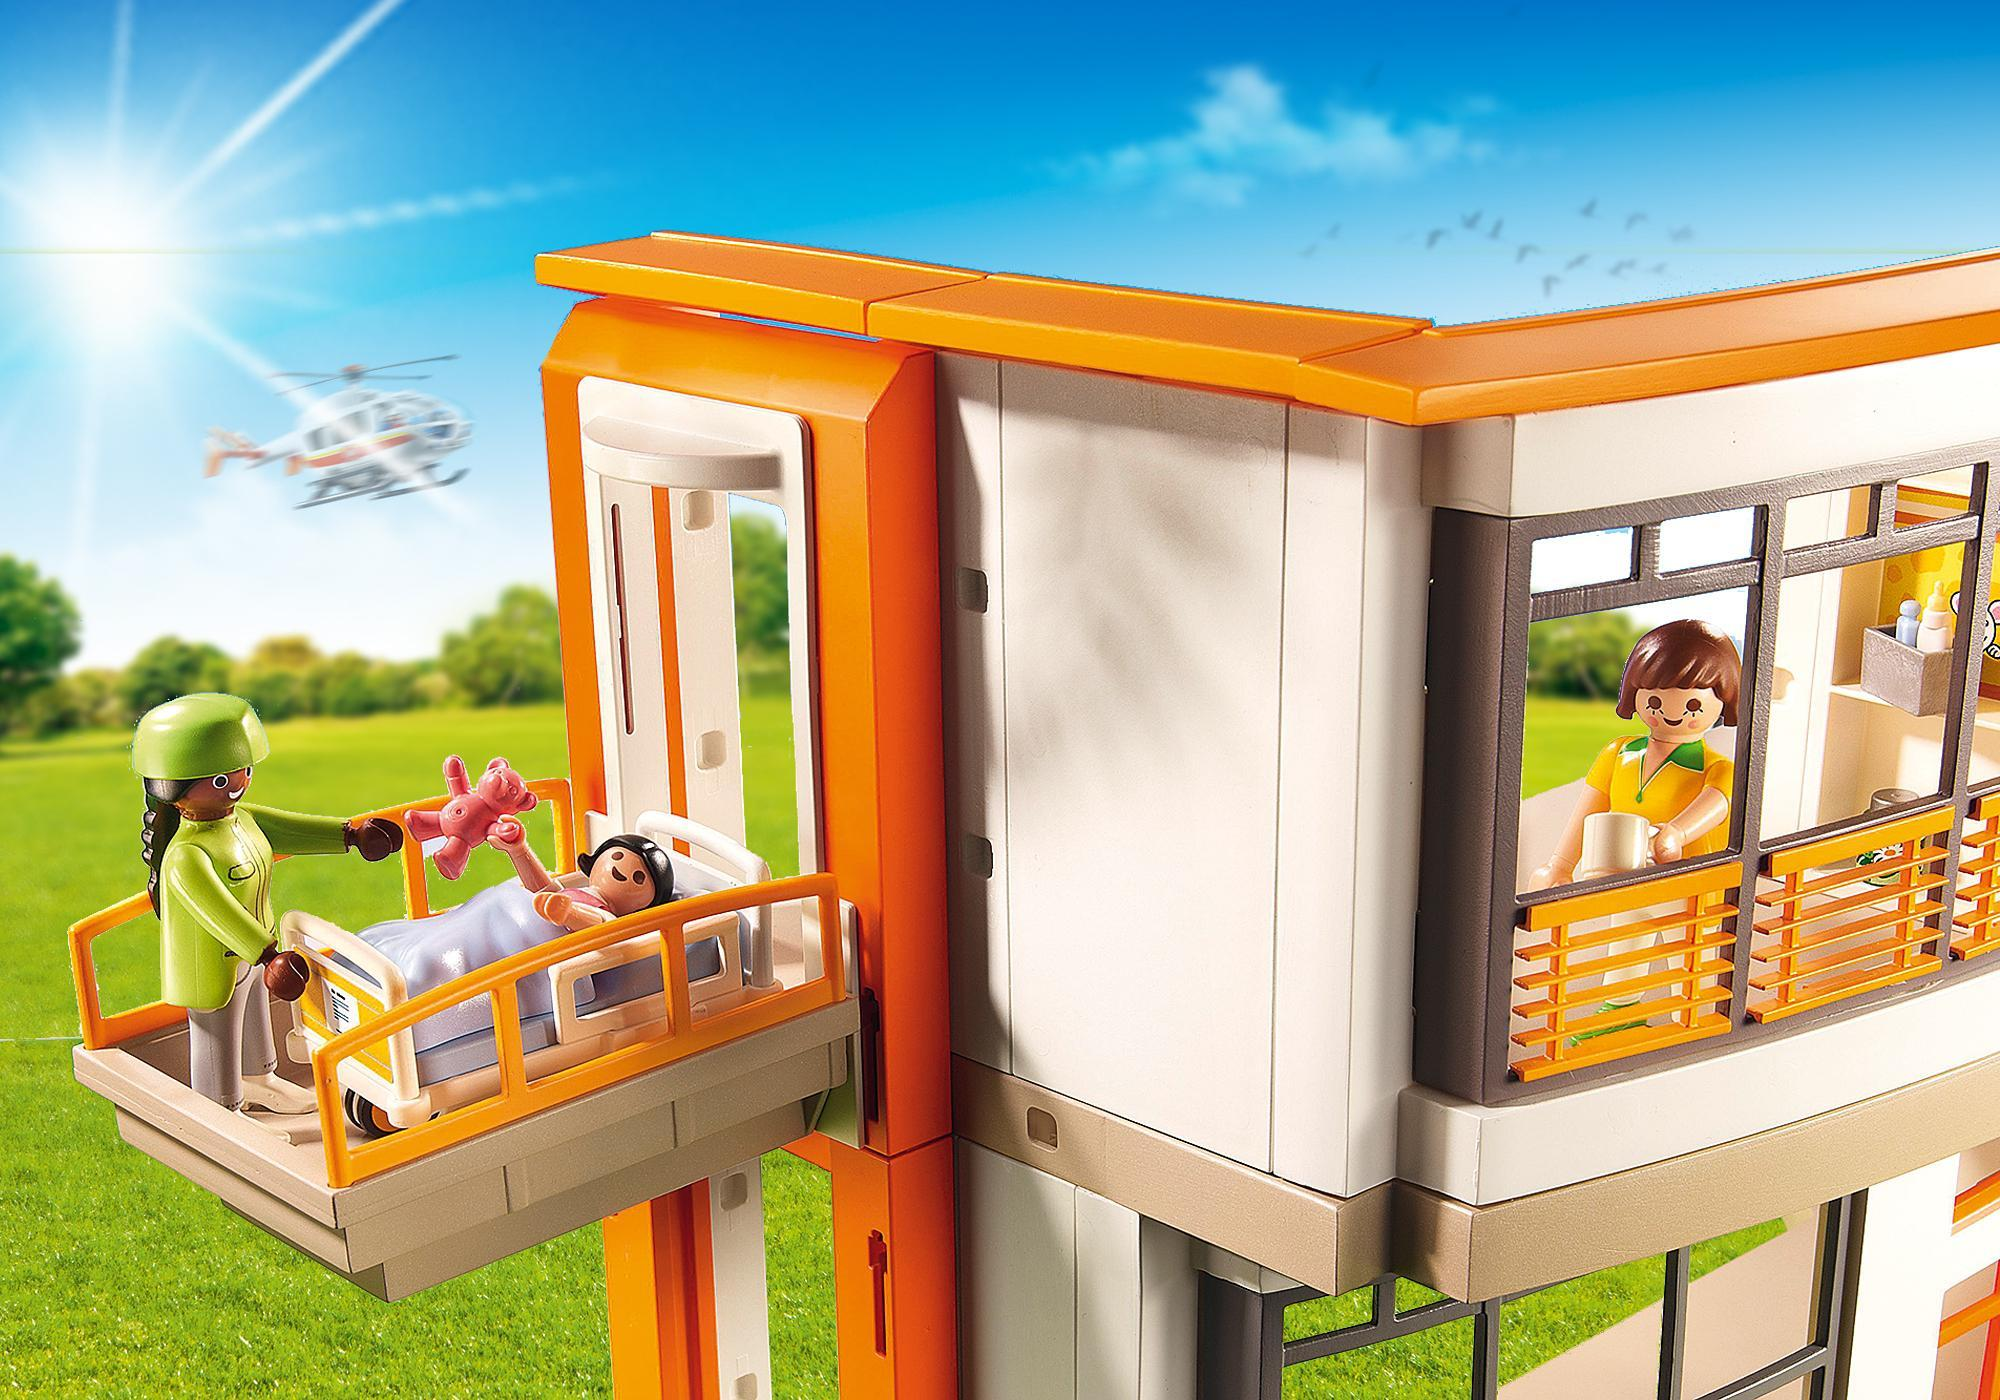 http://media.playmobil.com/i/playmobil/6657_product_extra4/Hôpital pédiatrique aménagé